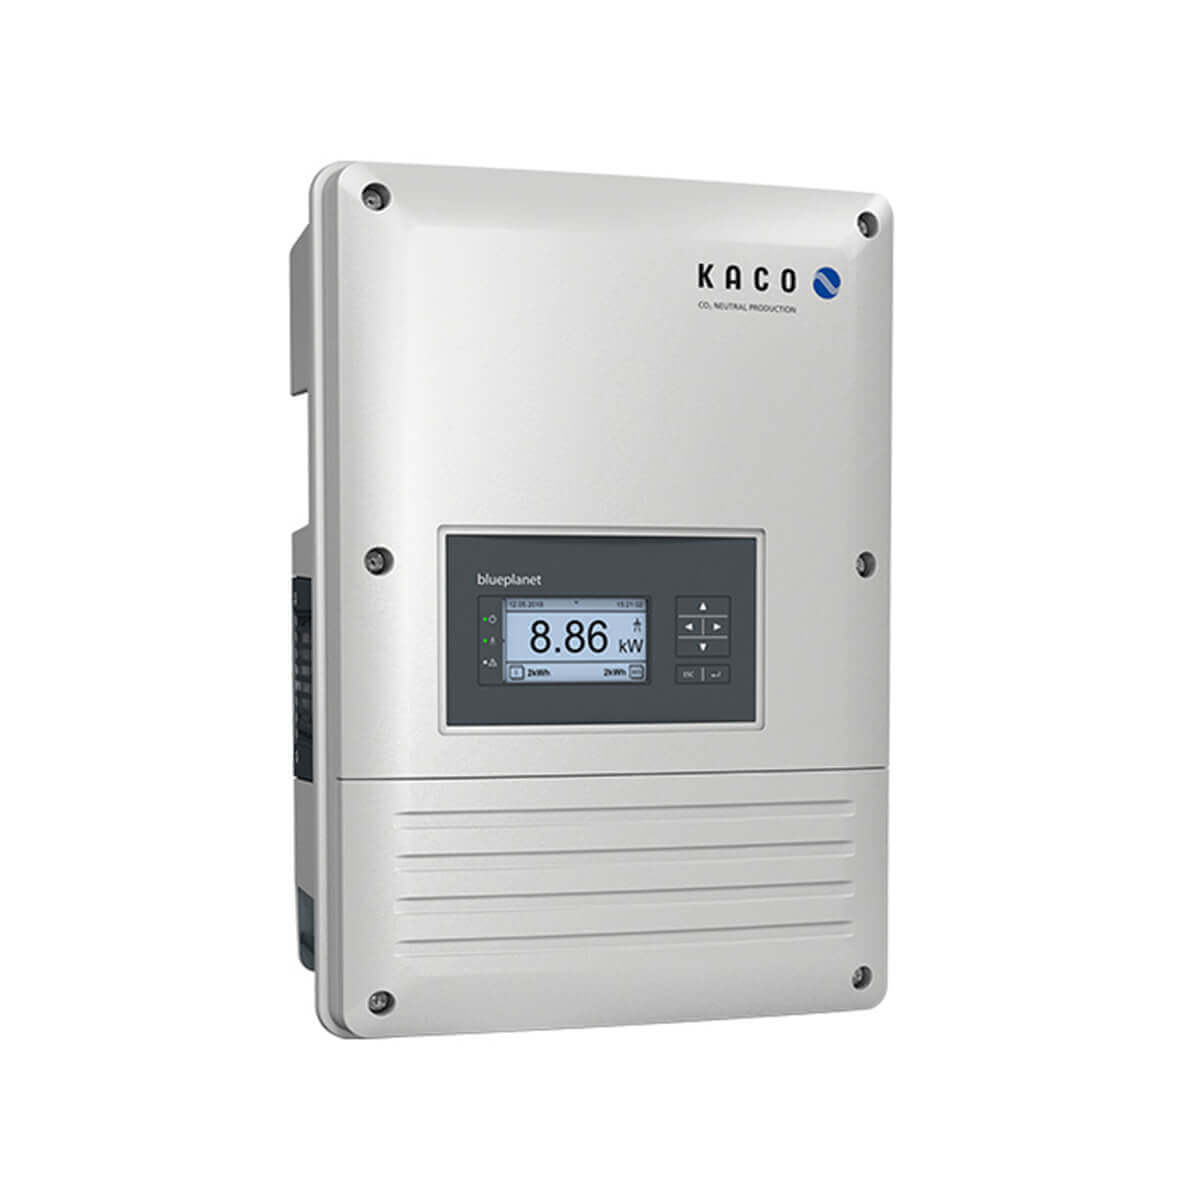 kaco 8.6kW inverter, kaco blueplanet 8.6kW inverter, kaco blueplanet 8.6tl3 inverter, kaco blueplanet 8.6tl3, kaco blueplanet 8.6 kW